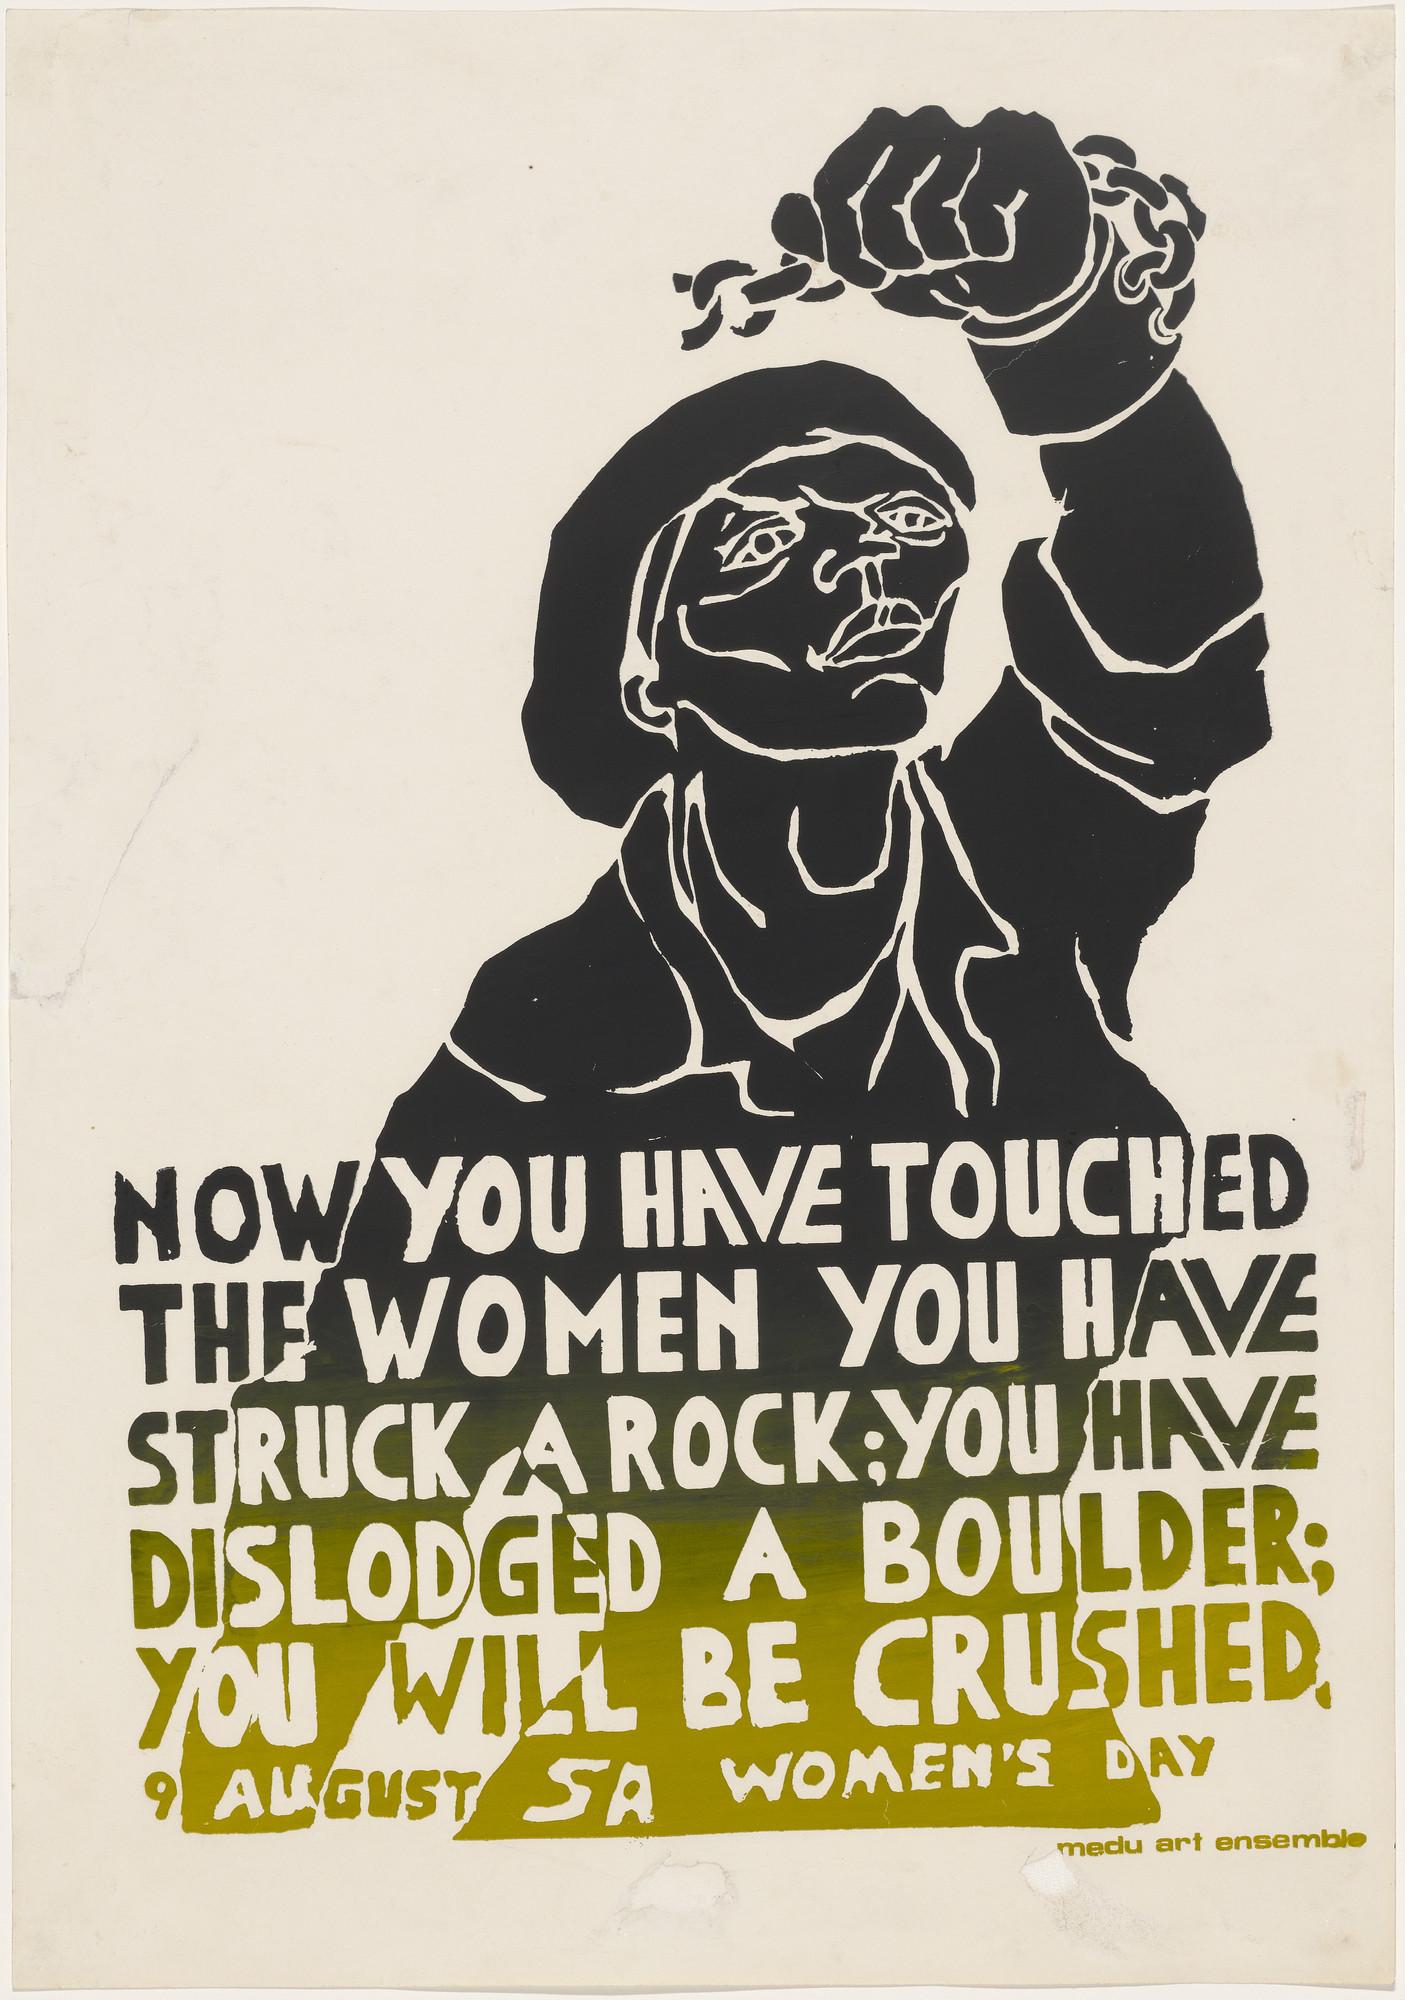 Medu Art Ensemble, Gaborone, Botswana. You Have Struck a Rock. 1981 | MoMA